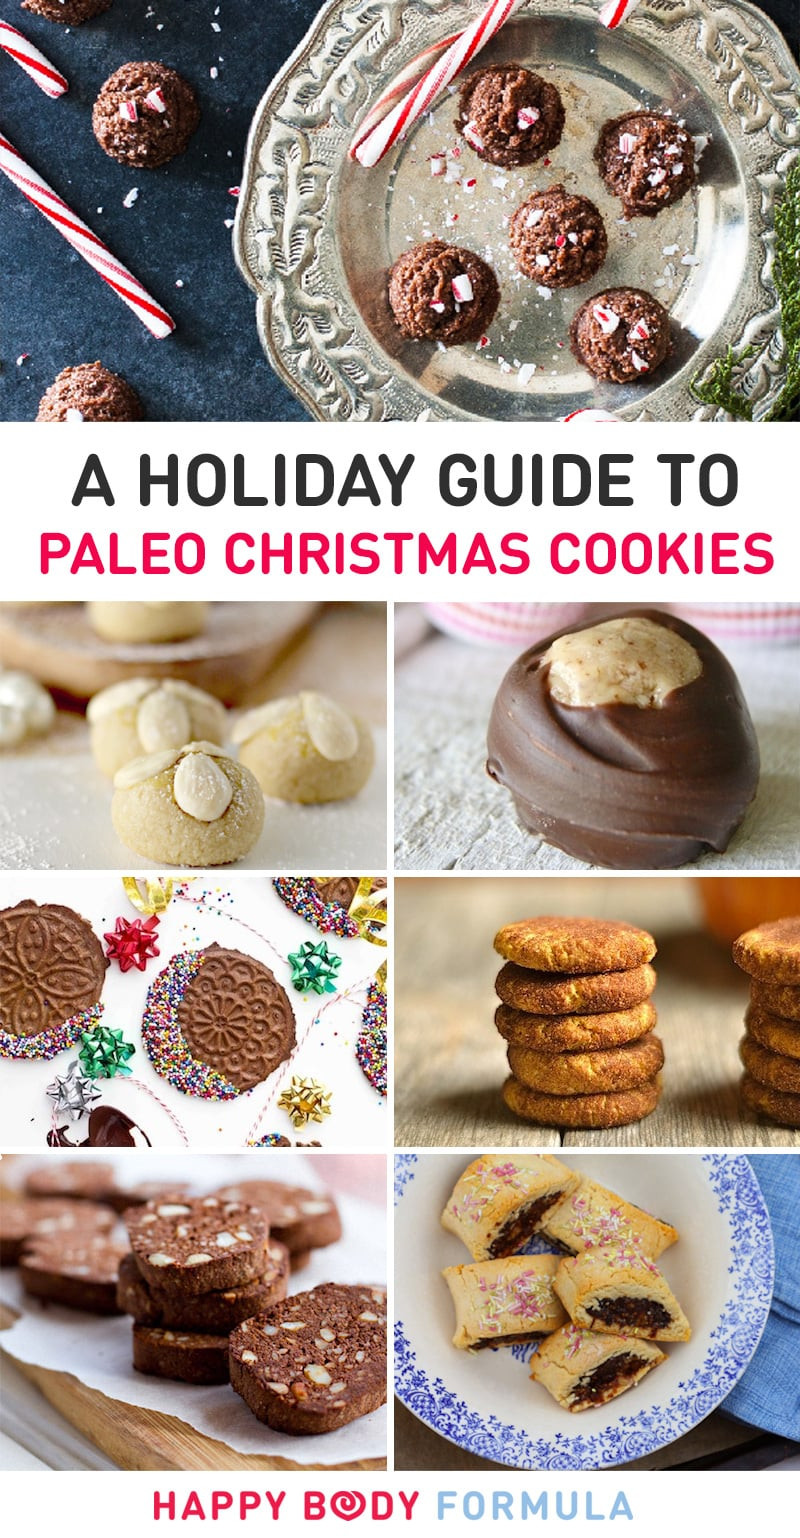 Paleo Christmas Desserts  The Best Paleo Christmas Cookie Recipes